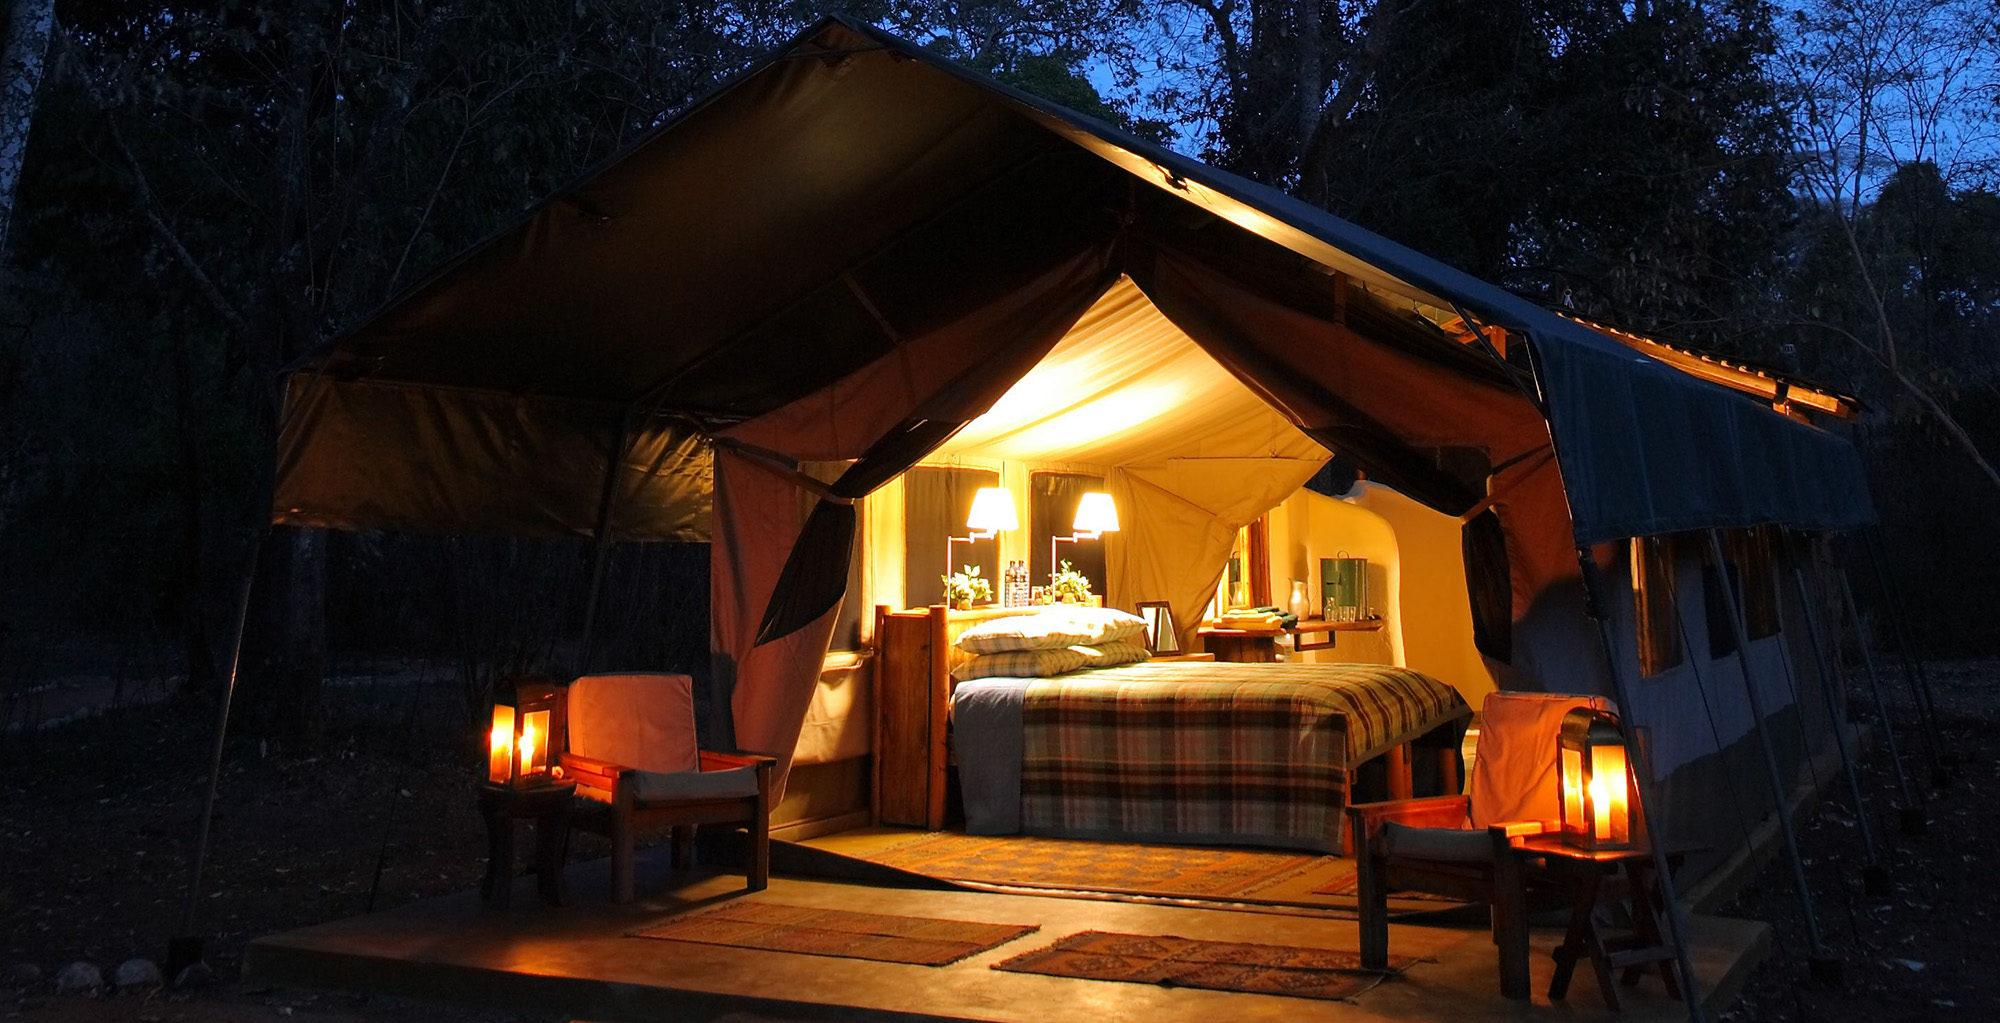 Kenya-Kitich-Camp-Exterior